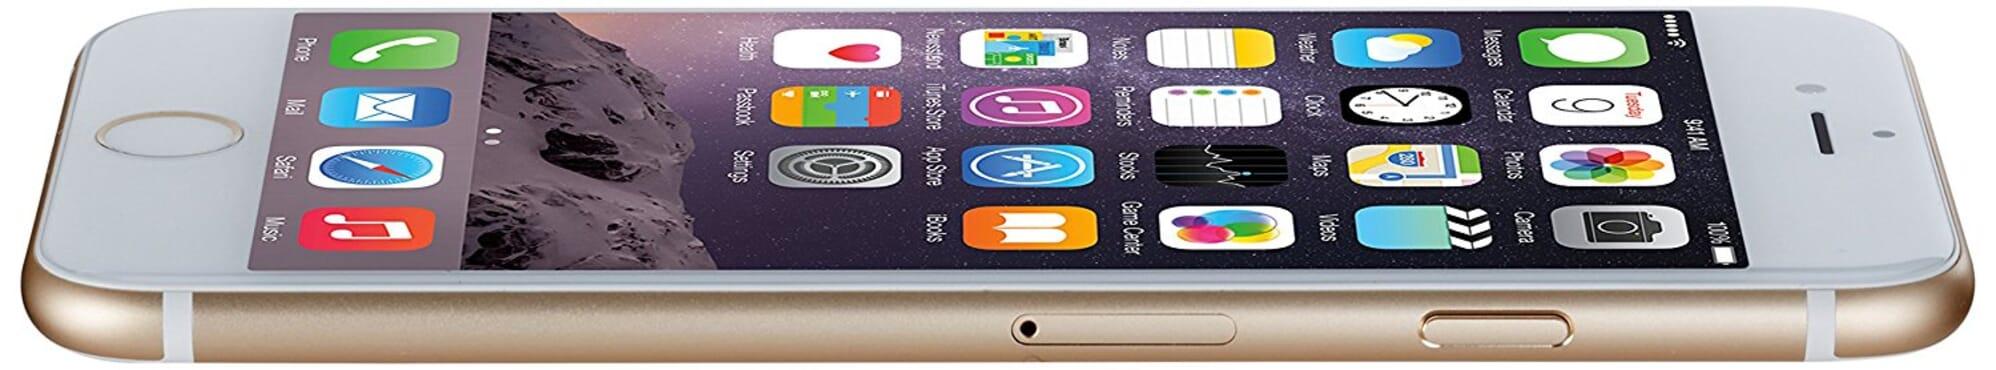 iPhone 6 16GB Gold (GSM)